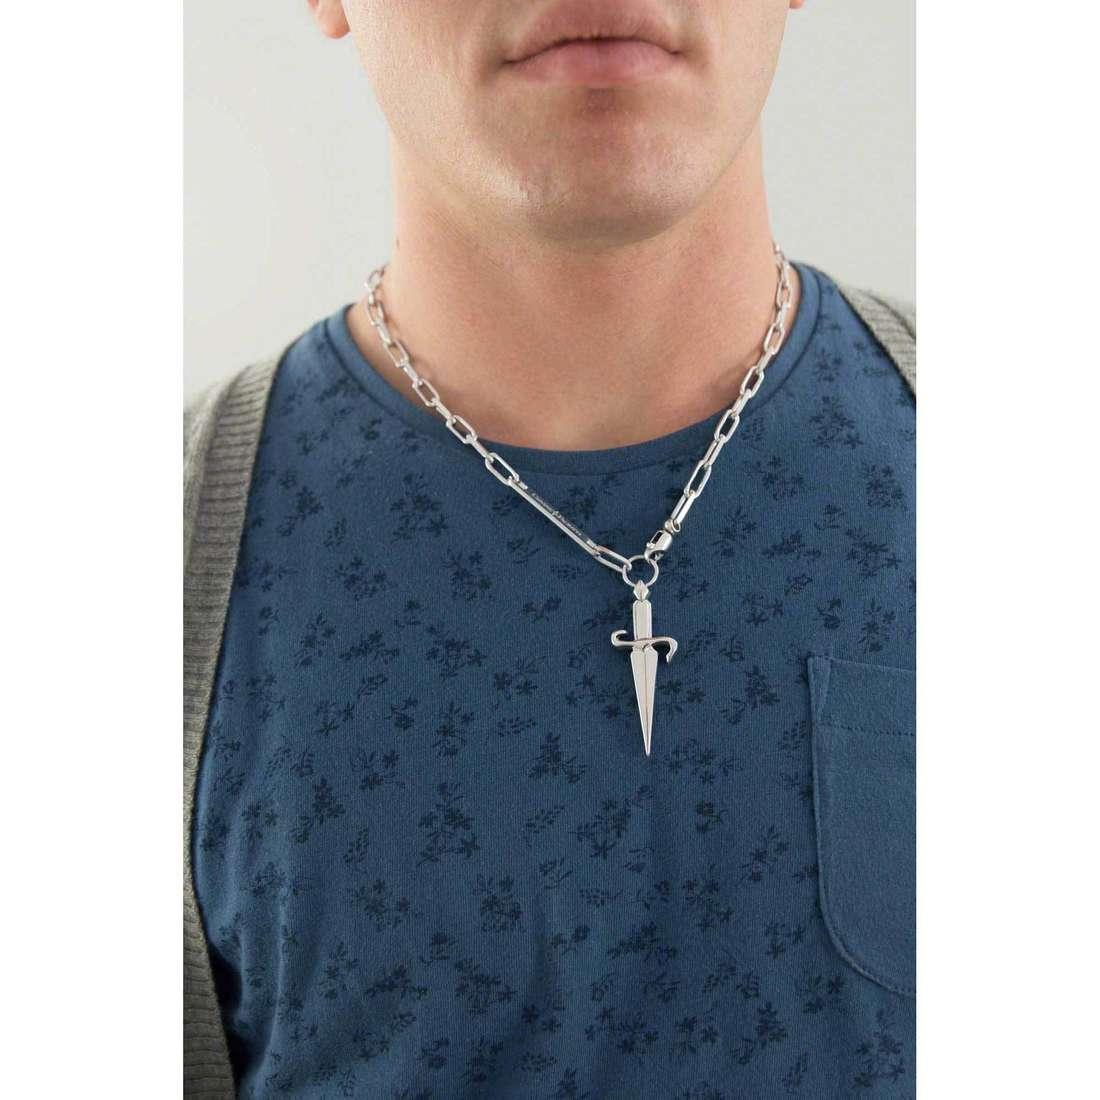 Cesare Paciotti necklaces man JPCL0116B indosso